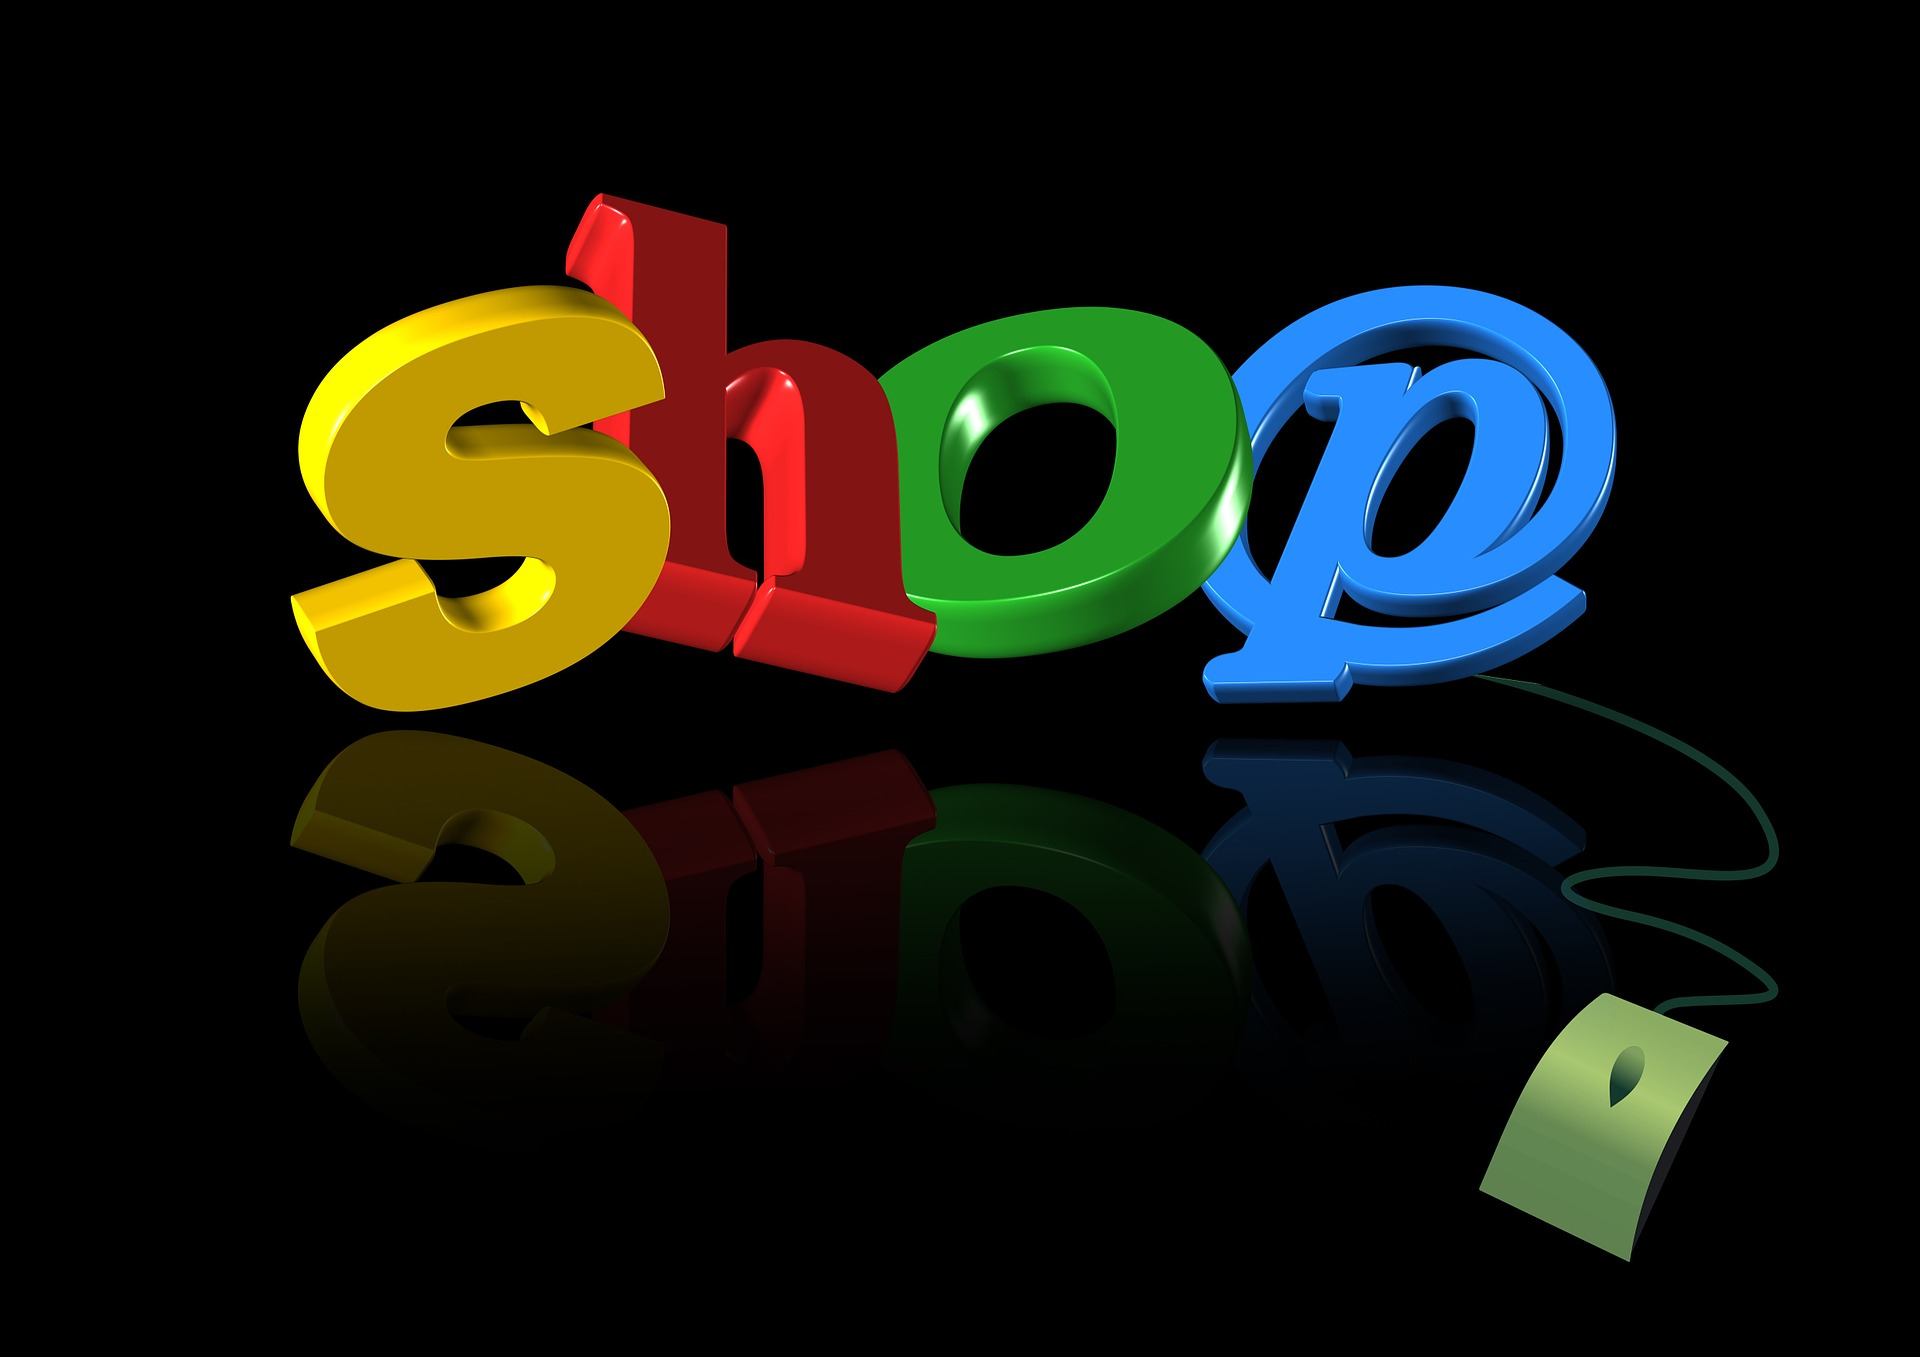 Start din egen webshop med et godt lån på nettet